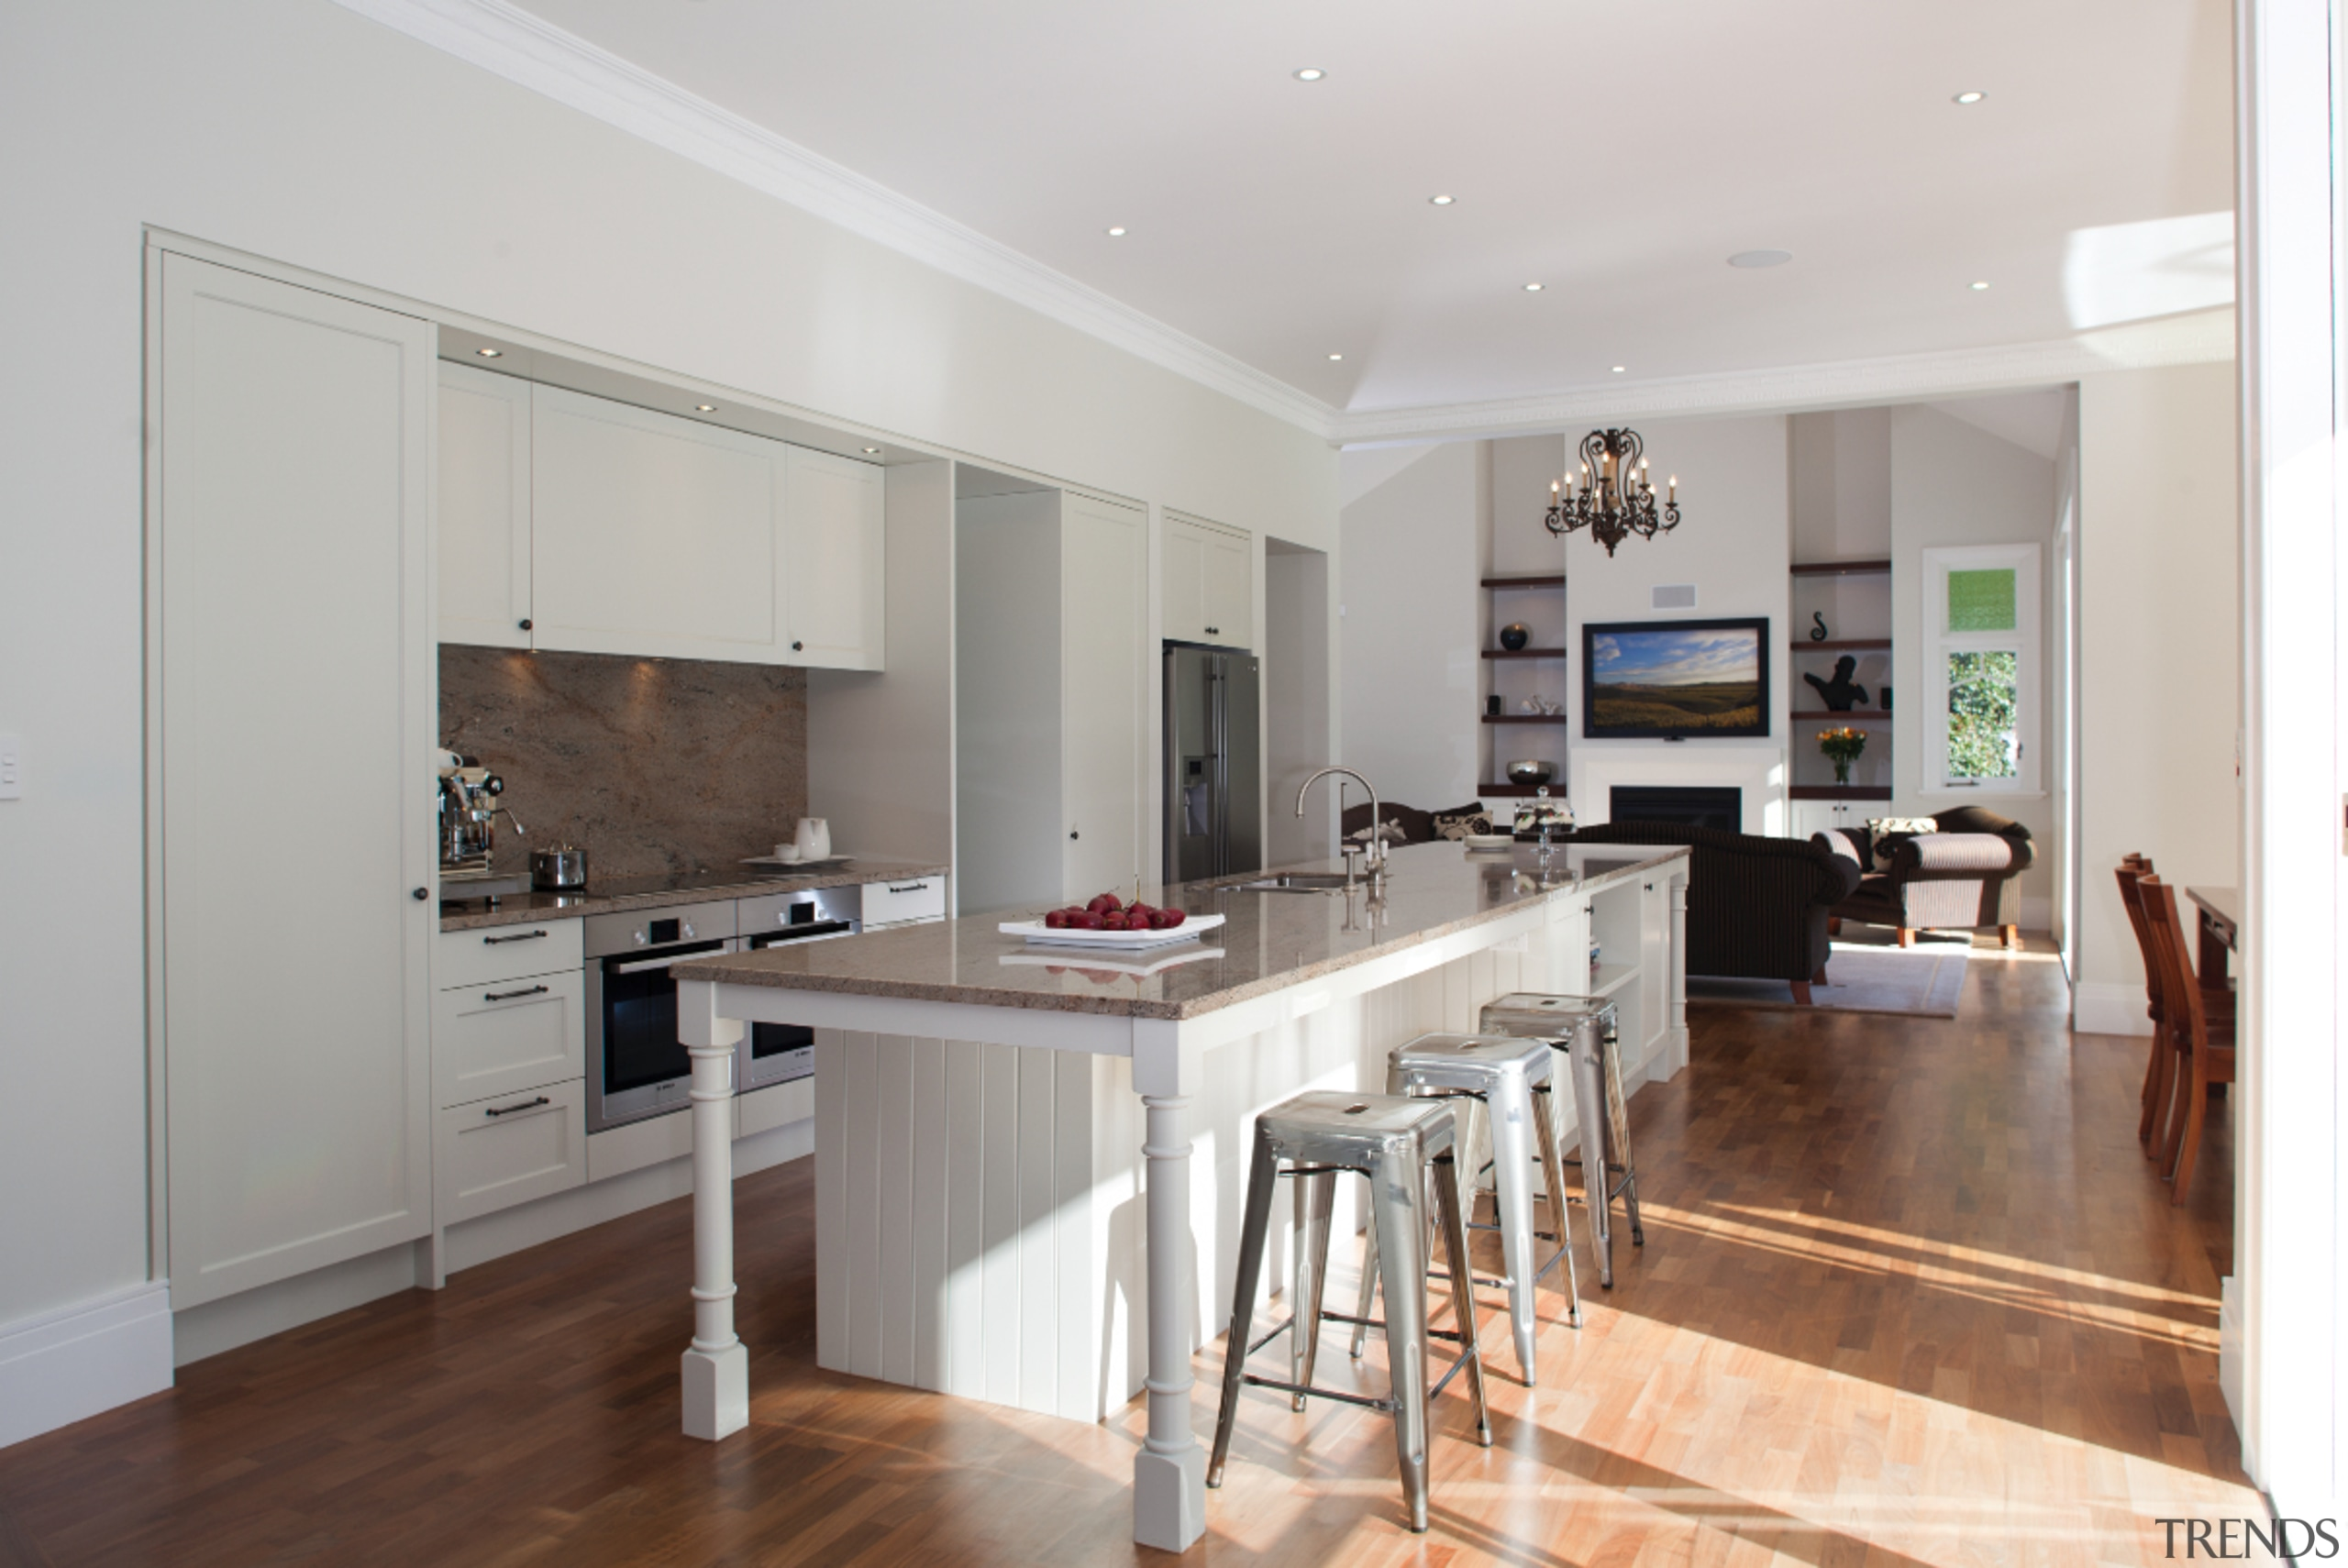 Epsom - countertop | cuisine classique | floor countertop, cuisine classique, floor, flooring, hardwood, interior design, kitchen, laminate flooring, property, real estate, room, wood flooring, gray